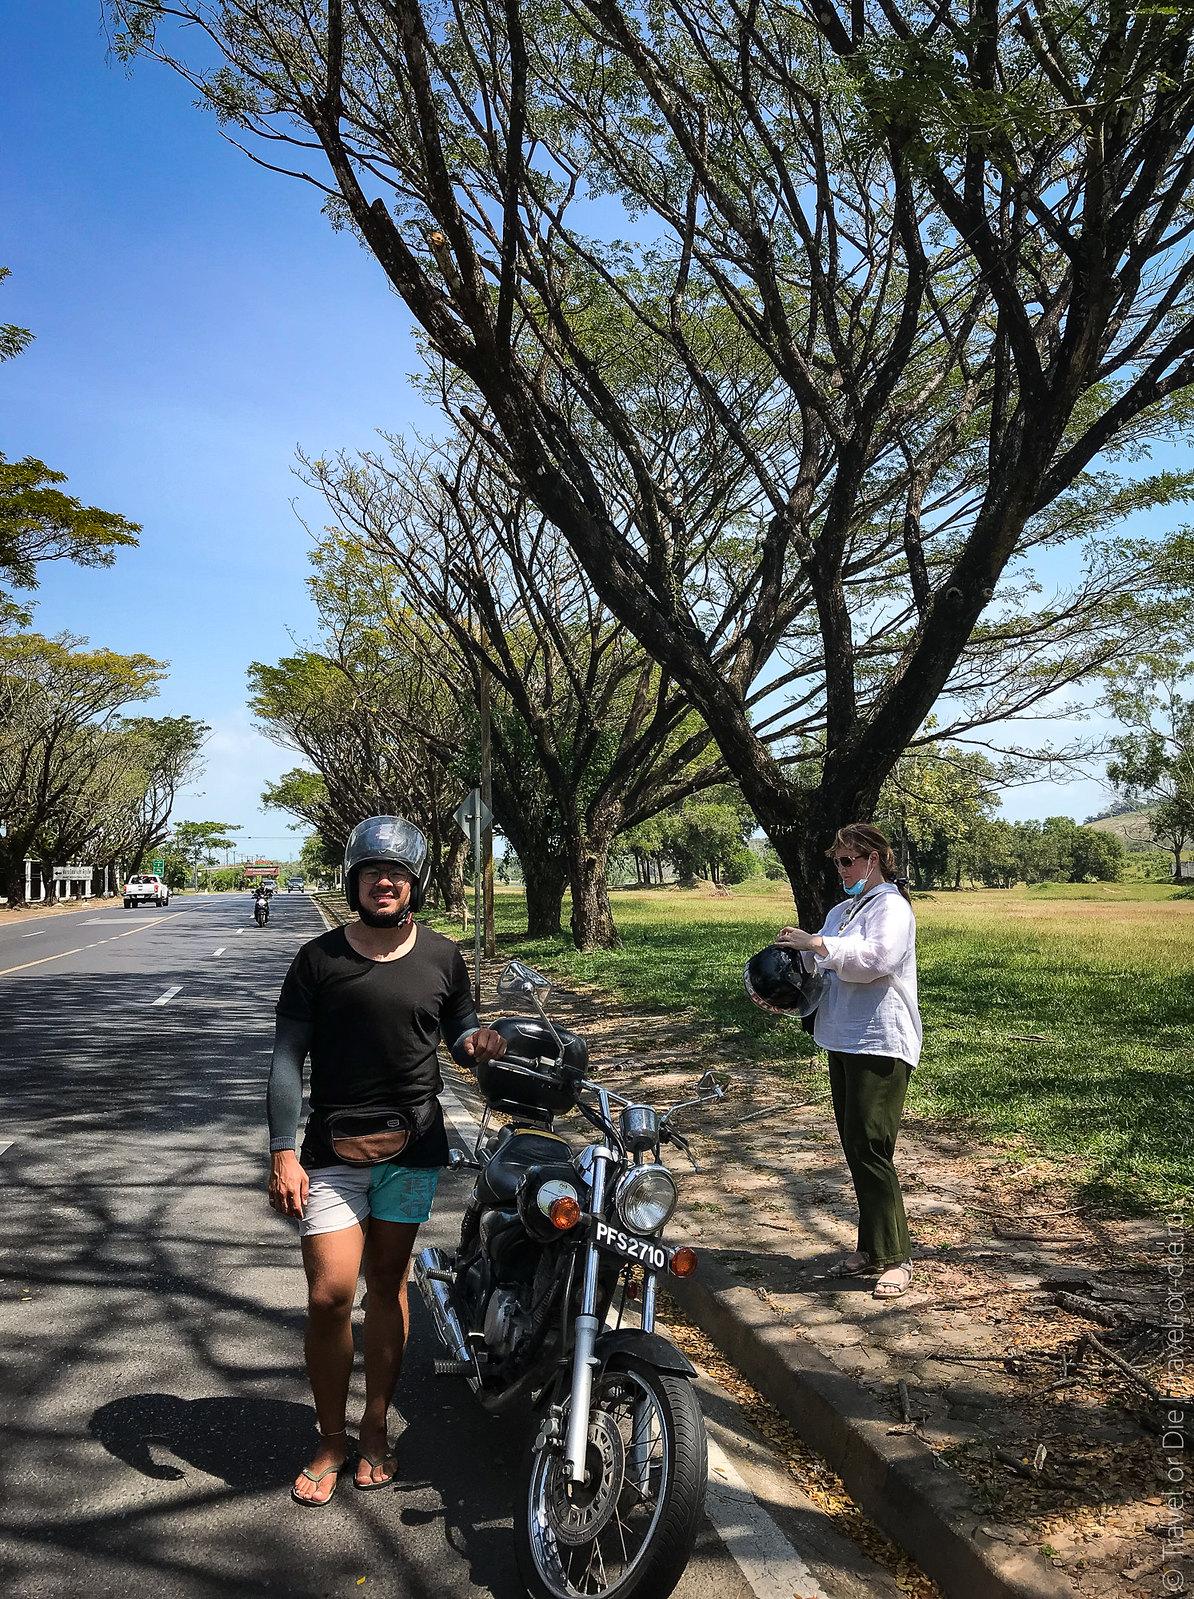 Motorbike-Tour-Phuket-матобайк-тур-на-Пхукете-1960